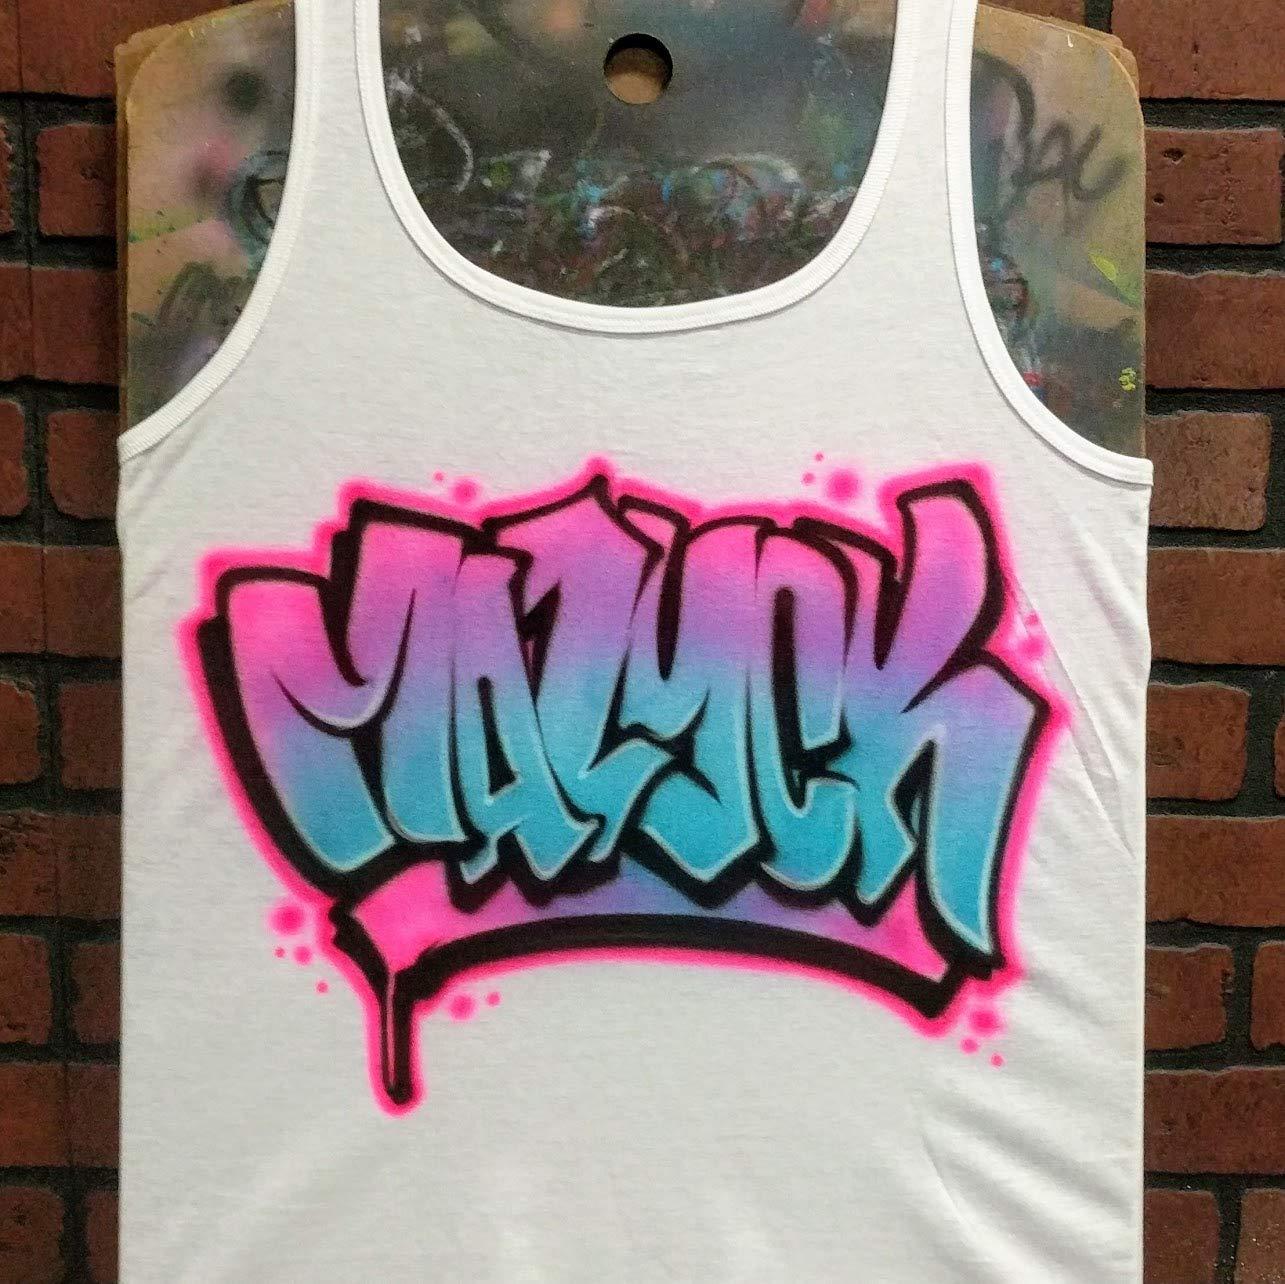 Amazon Personalized Airbrush Tank Top Graffiti Name Design